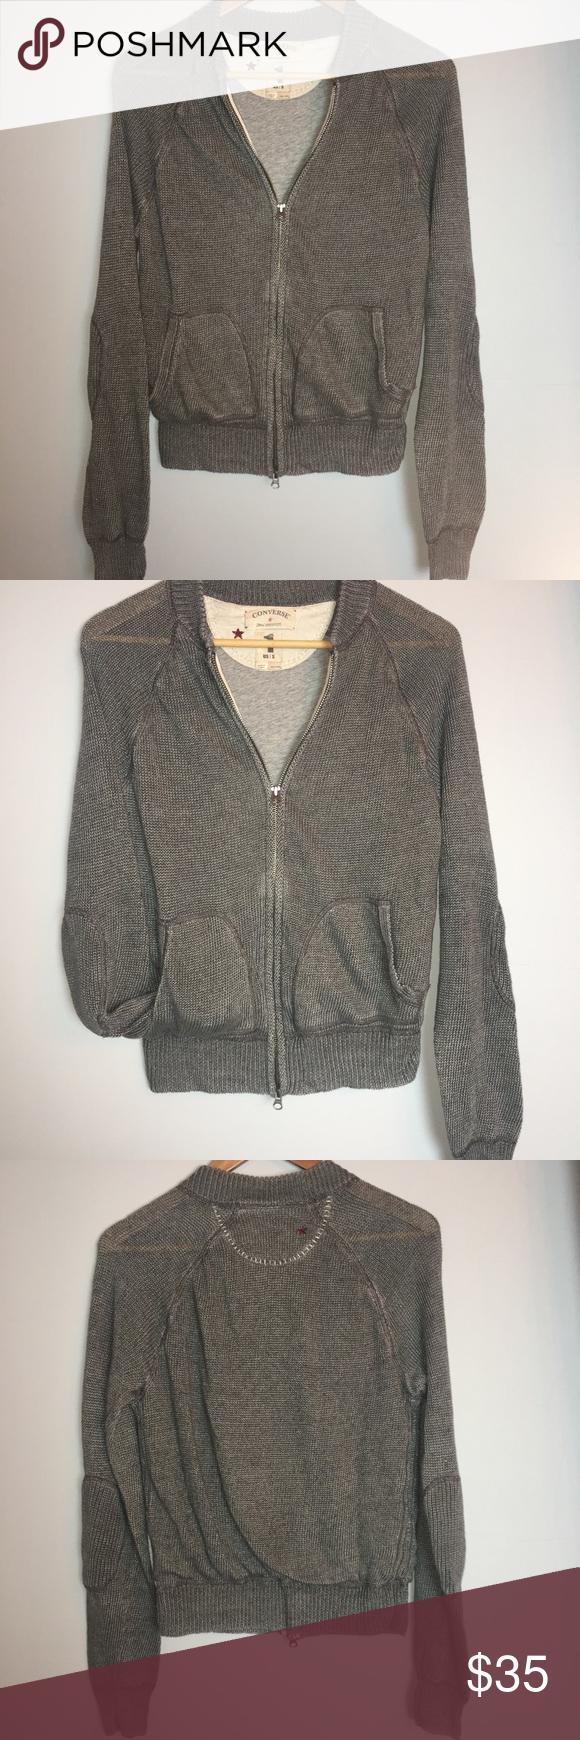 559348e28772 Converse 100% Linen Knit Sweater Jacket (S) Converse grey men s linen knit  zip up jacket with elbow patch detail. Super cool sweater!